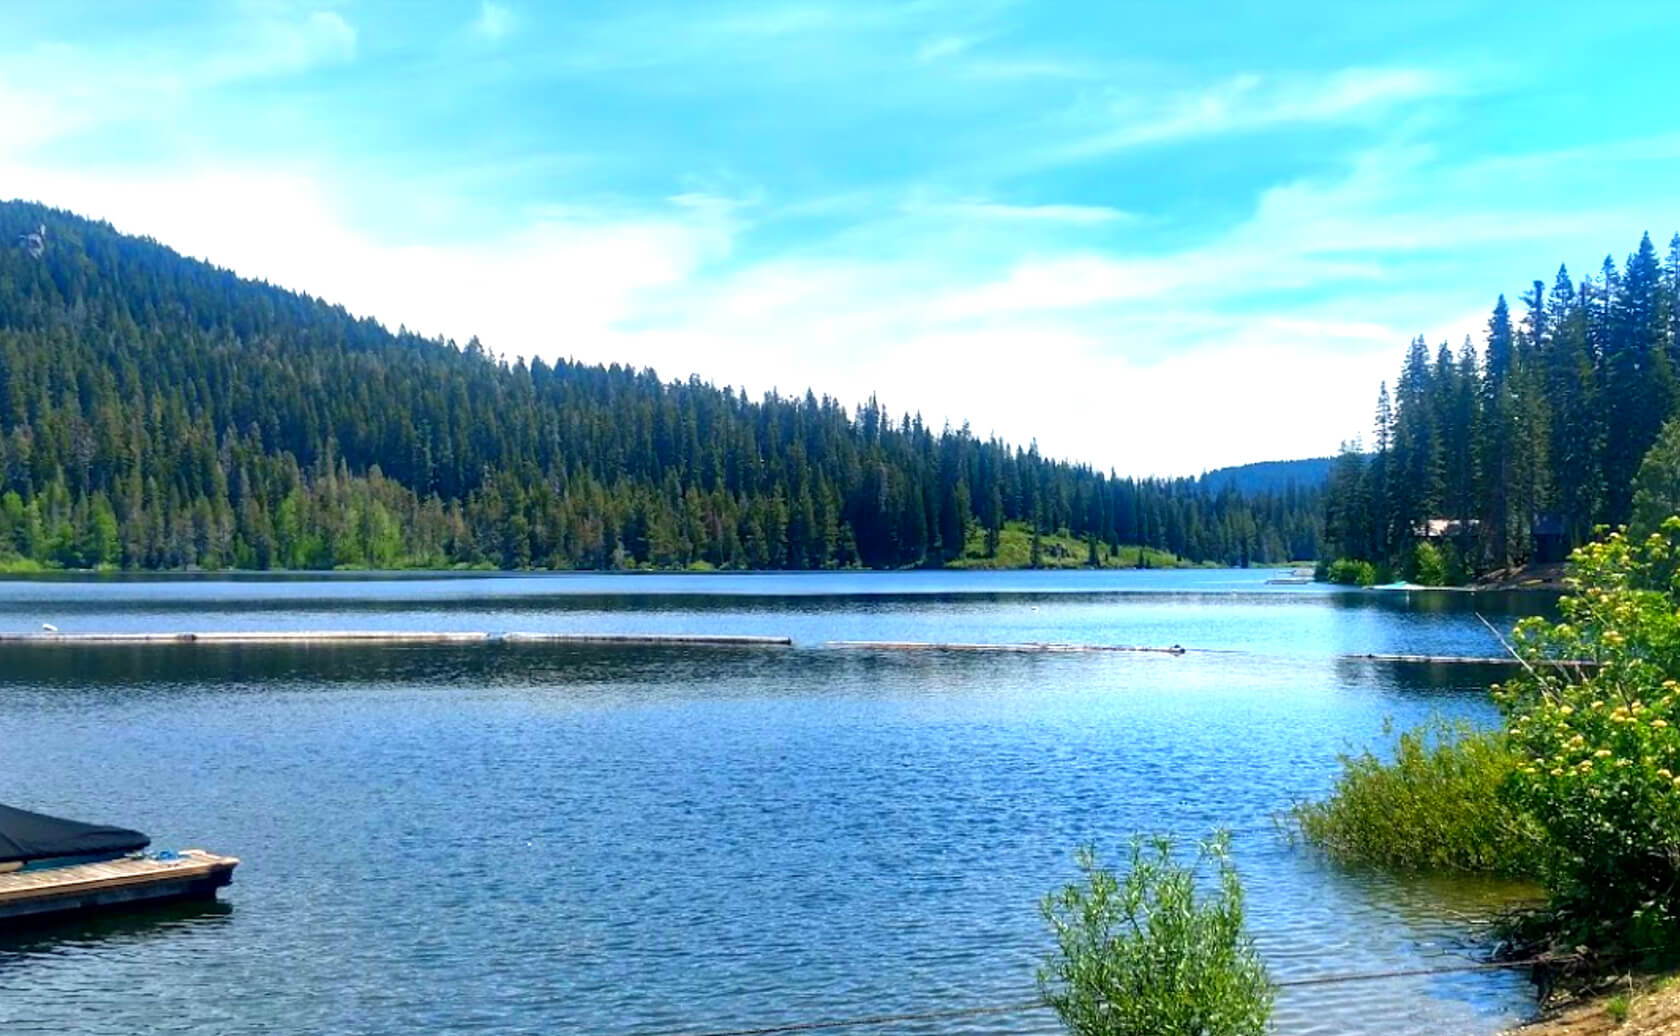 Bucks-Lake-Fishing-Guide-Report-California-02